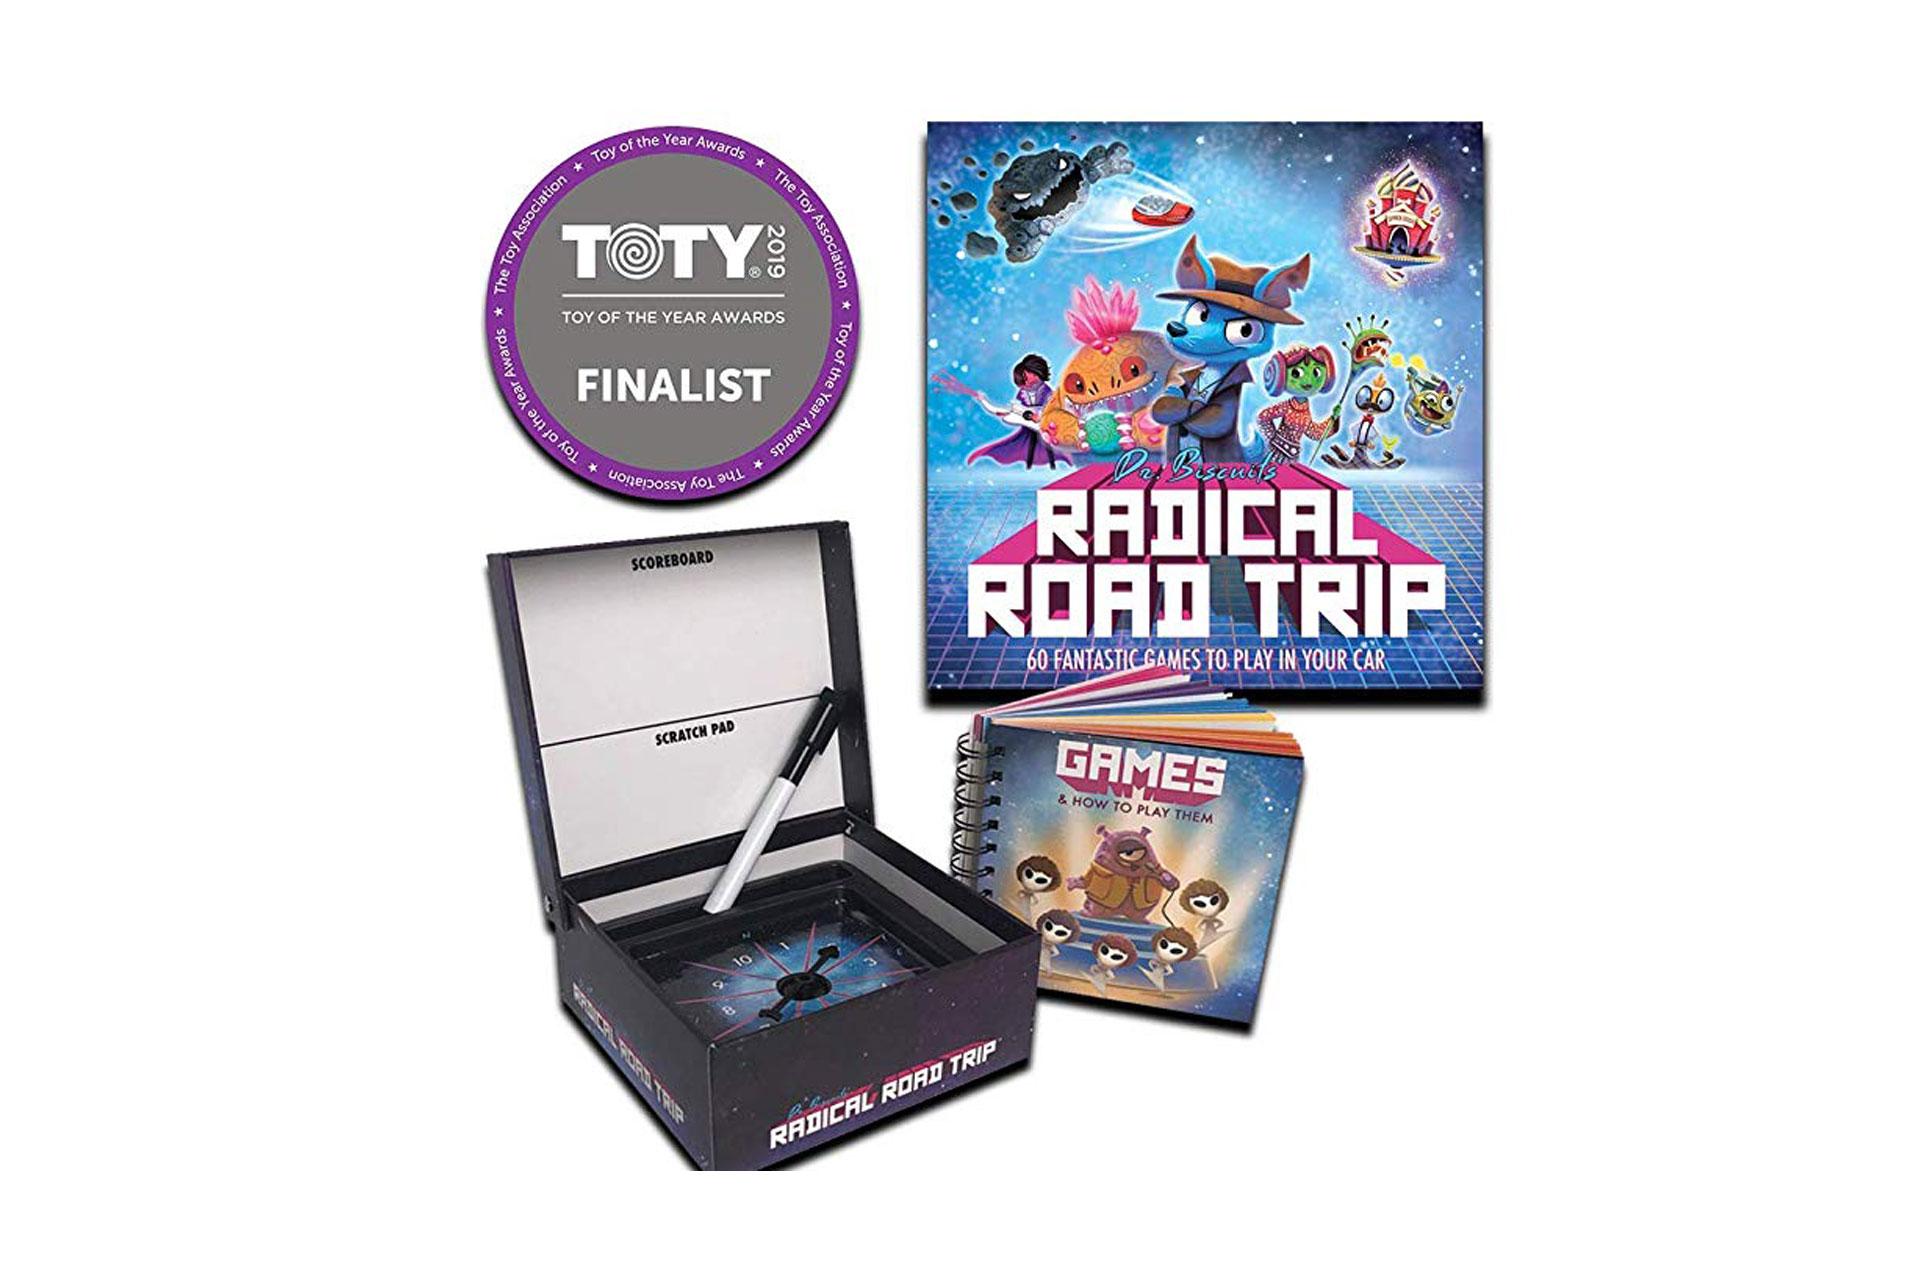 Radical Road Trip Travel Game; Courtesy of Amazon